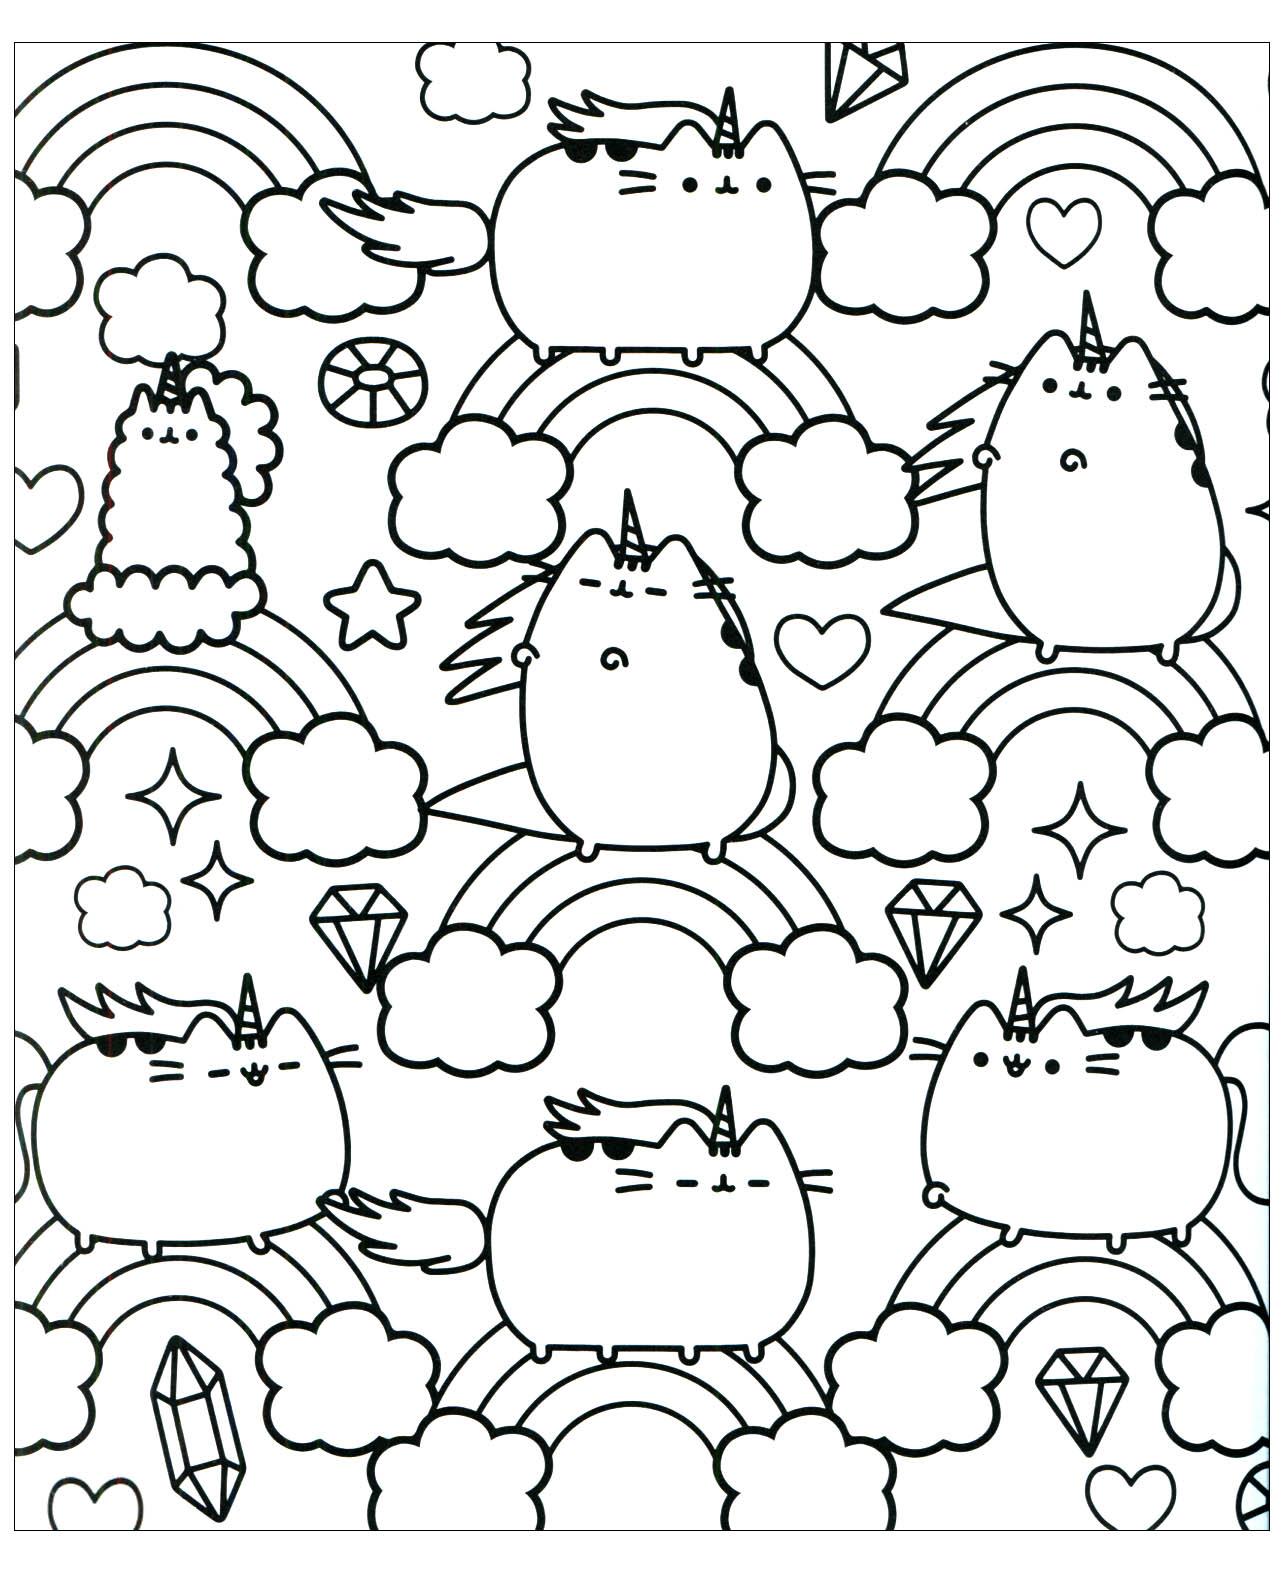 Doodle art doodling 33875